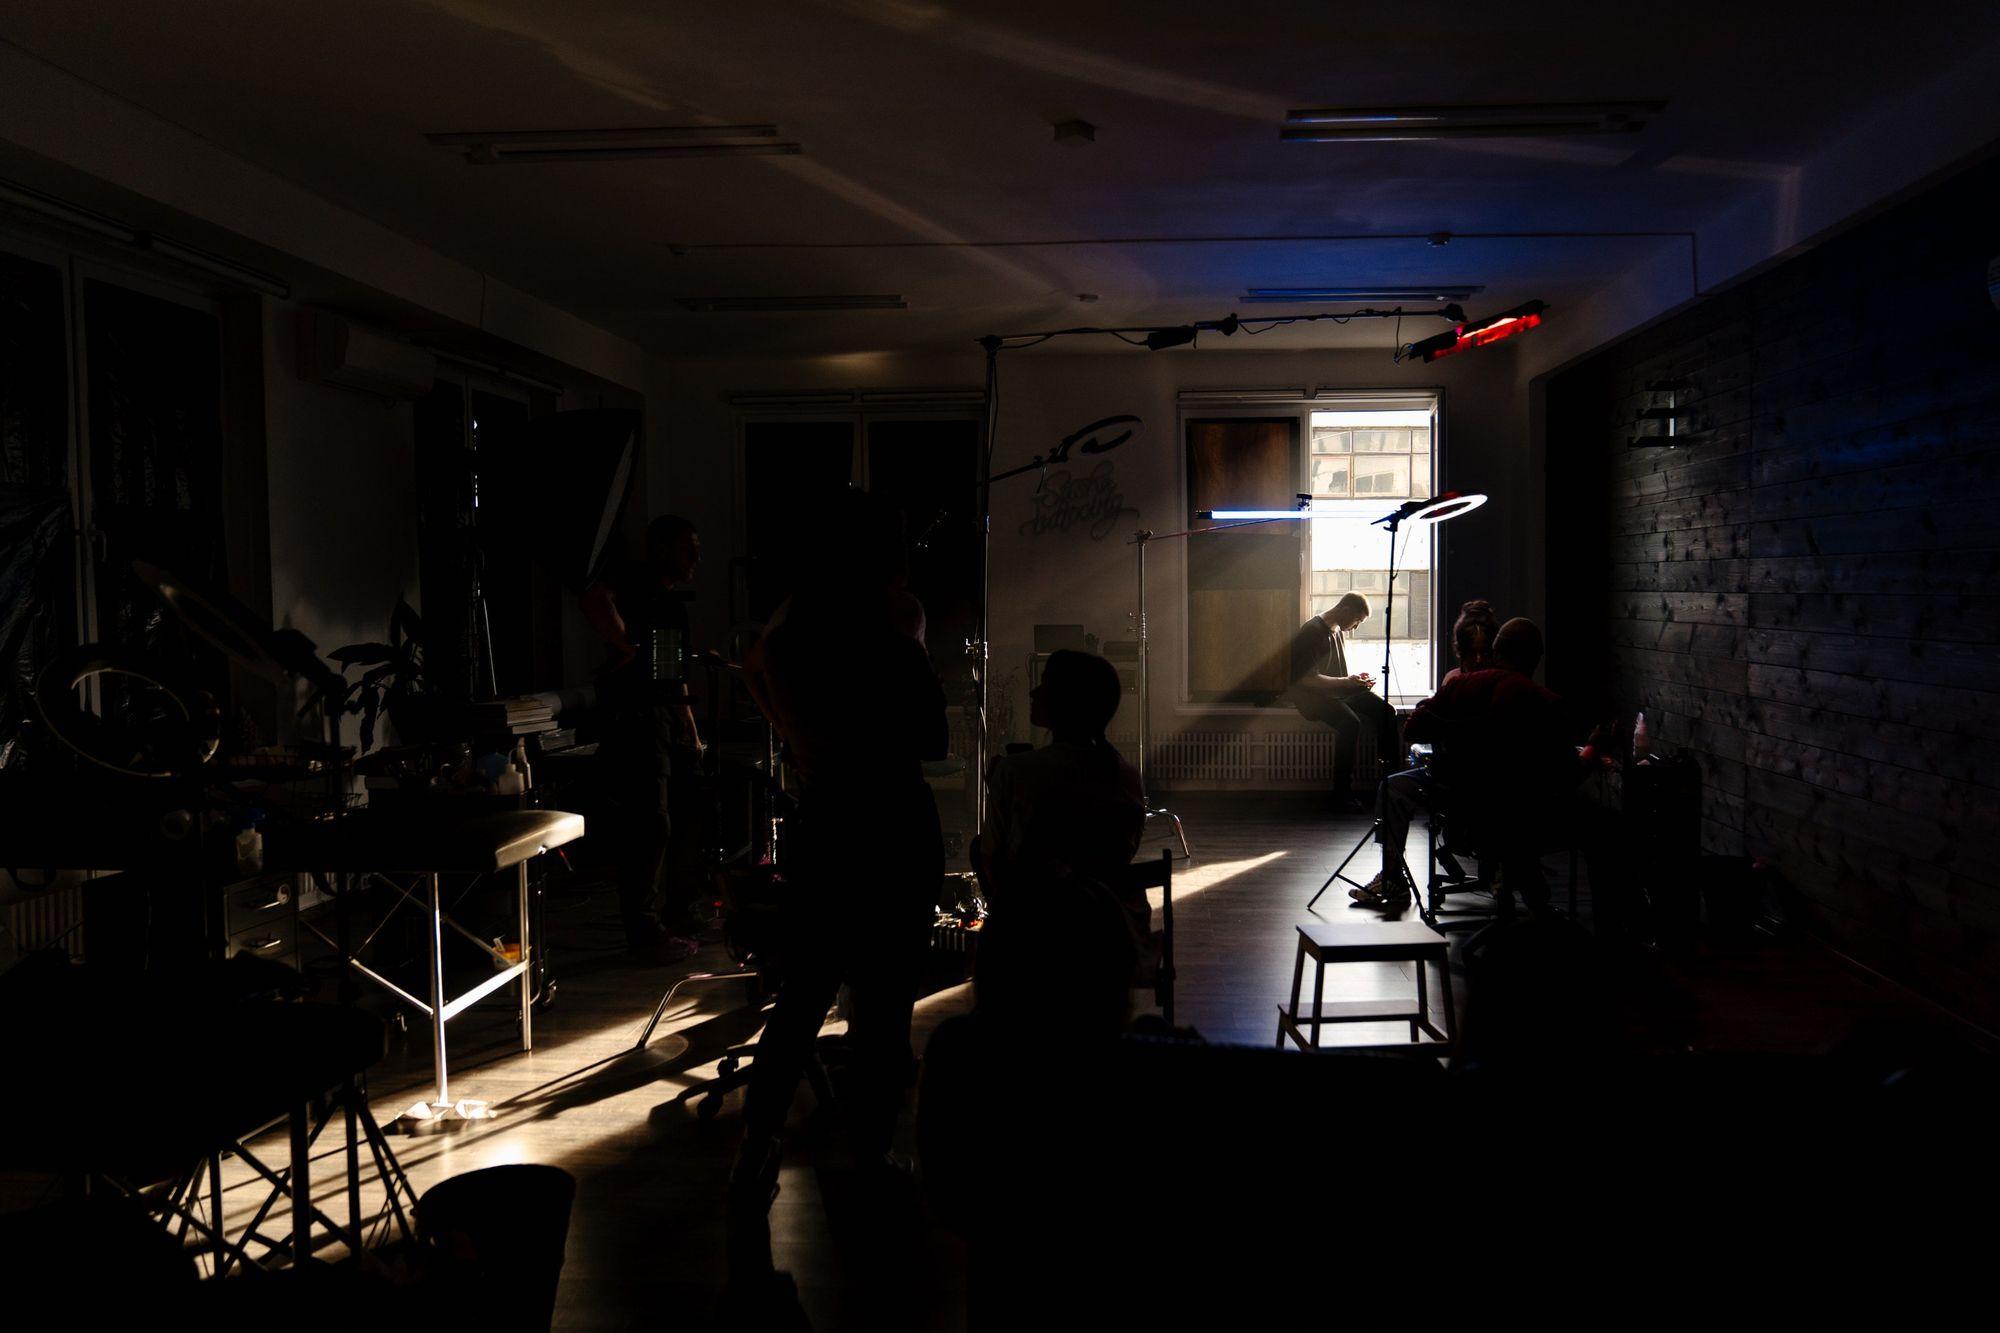 lighting-in-dark-roome